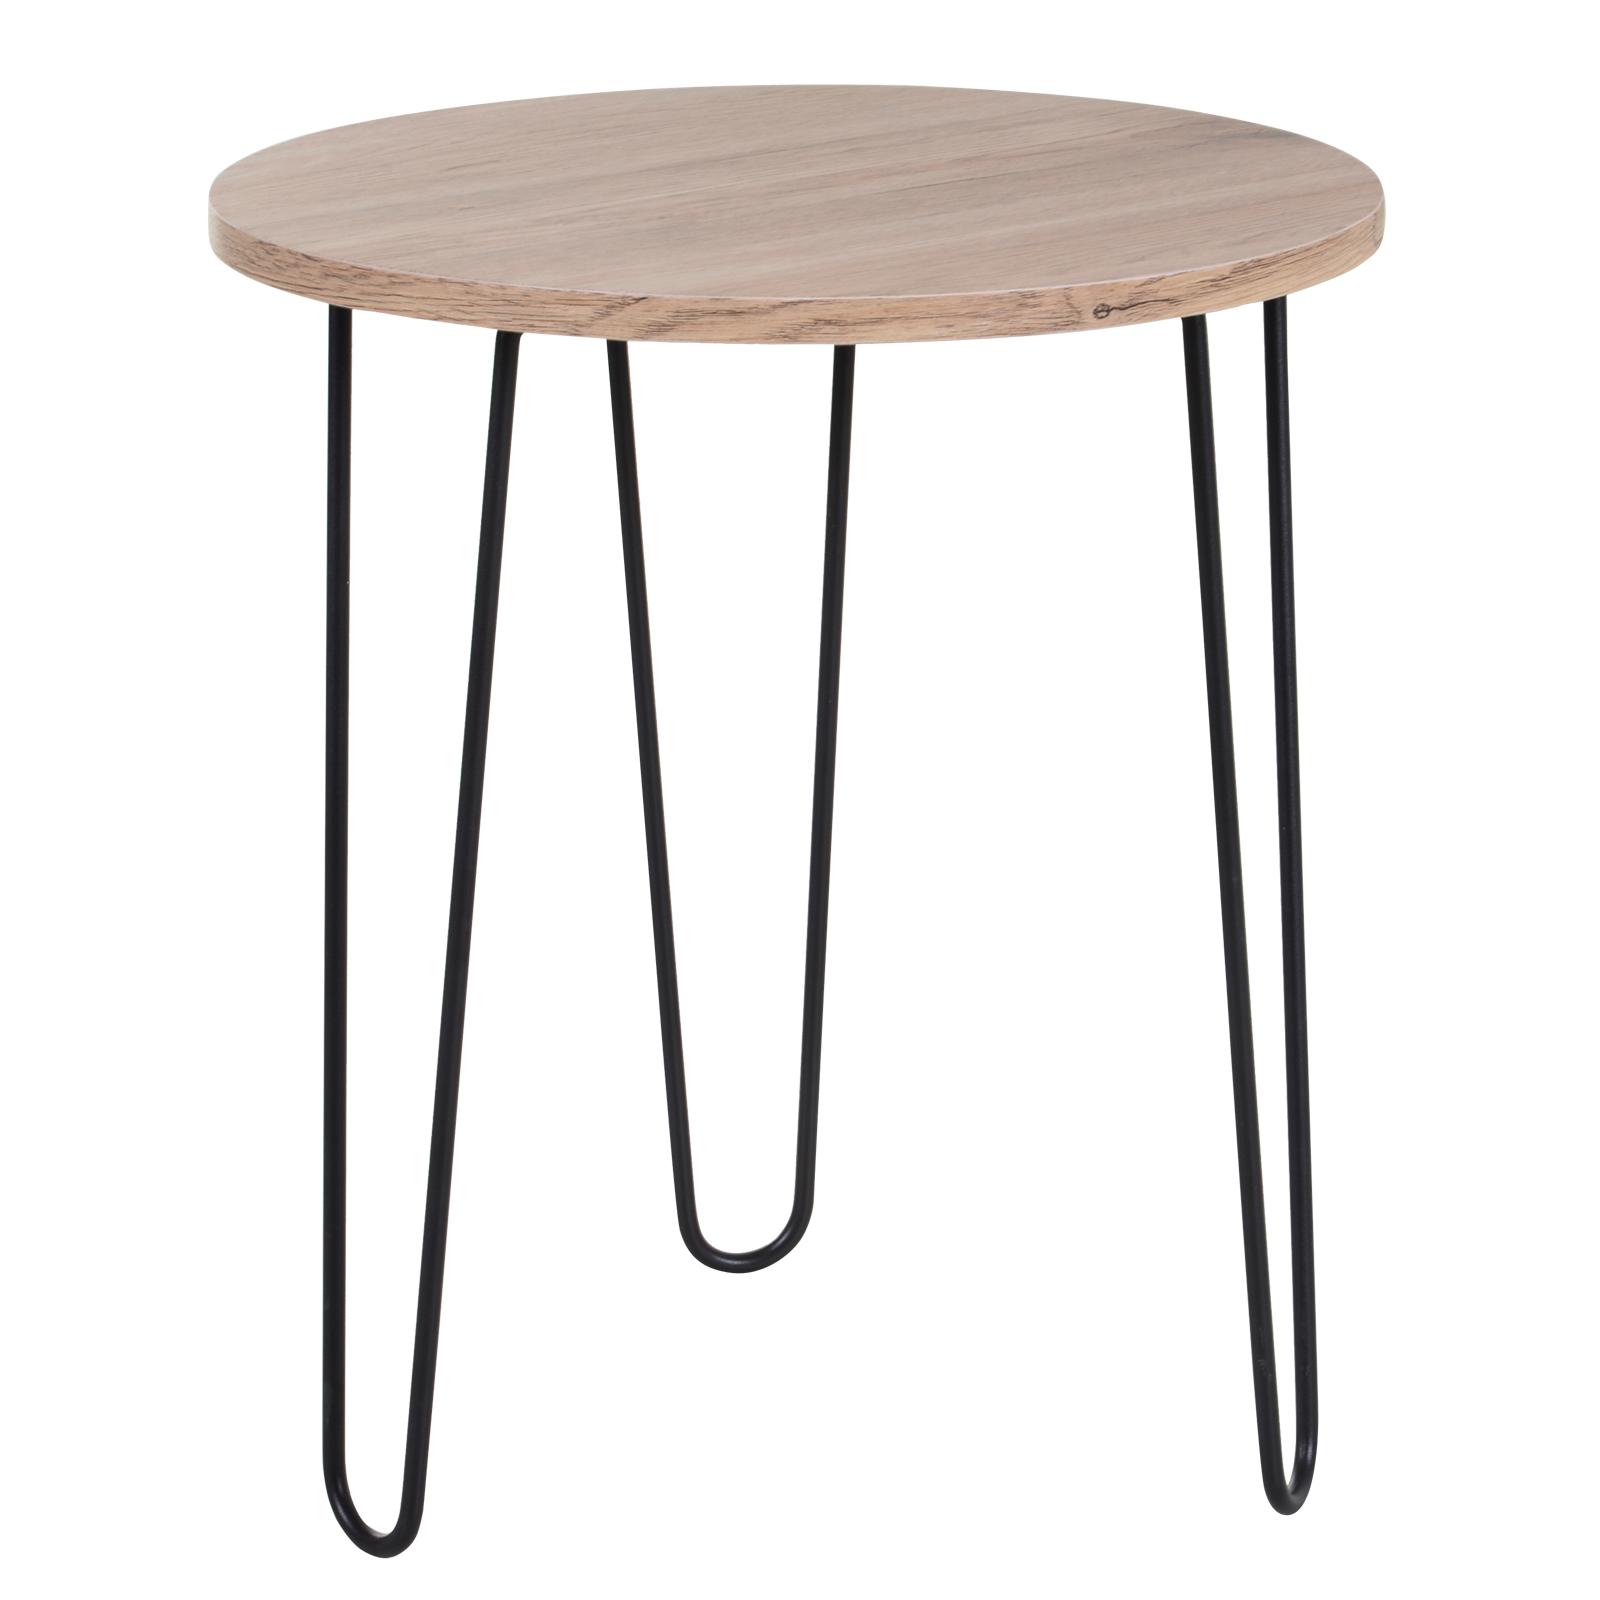 Table basse ronde design industriel